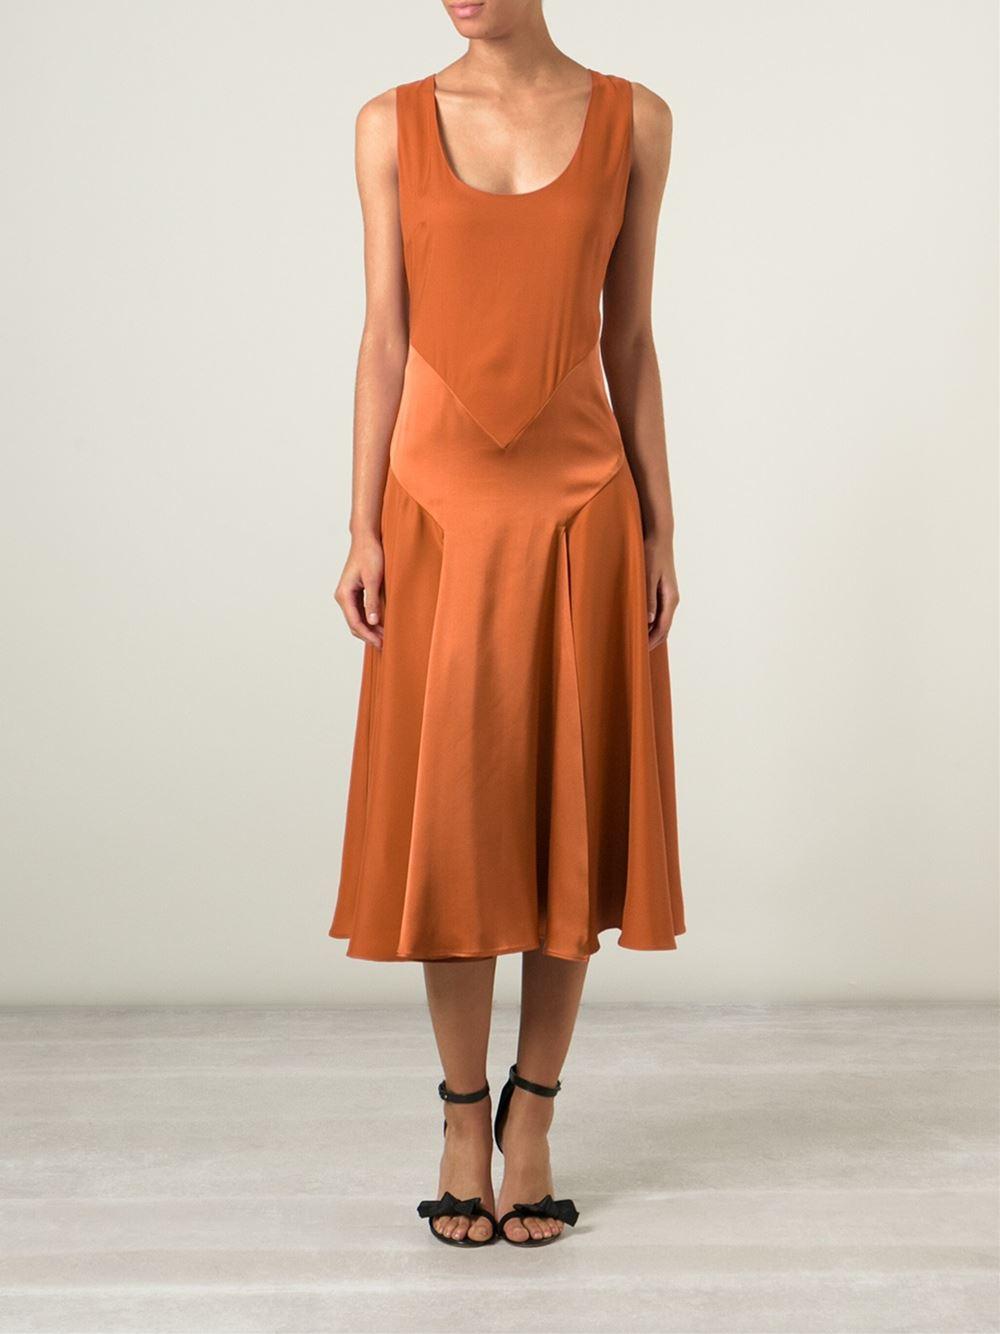 Burberry Prorsum Runway London Fashion Week Aw14: Burberry Prorsum Scoop Neck Dress In Orange